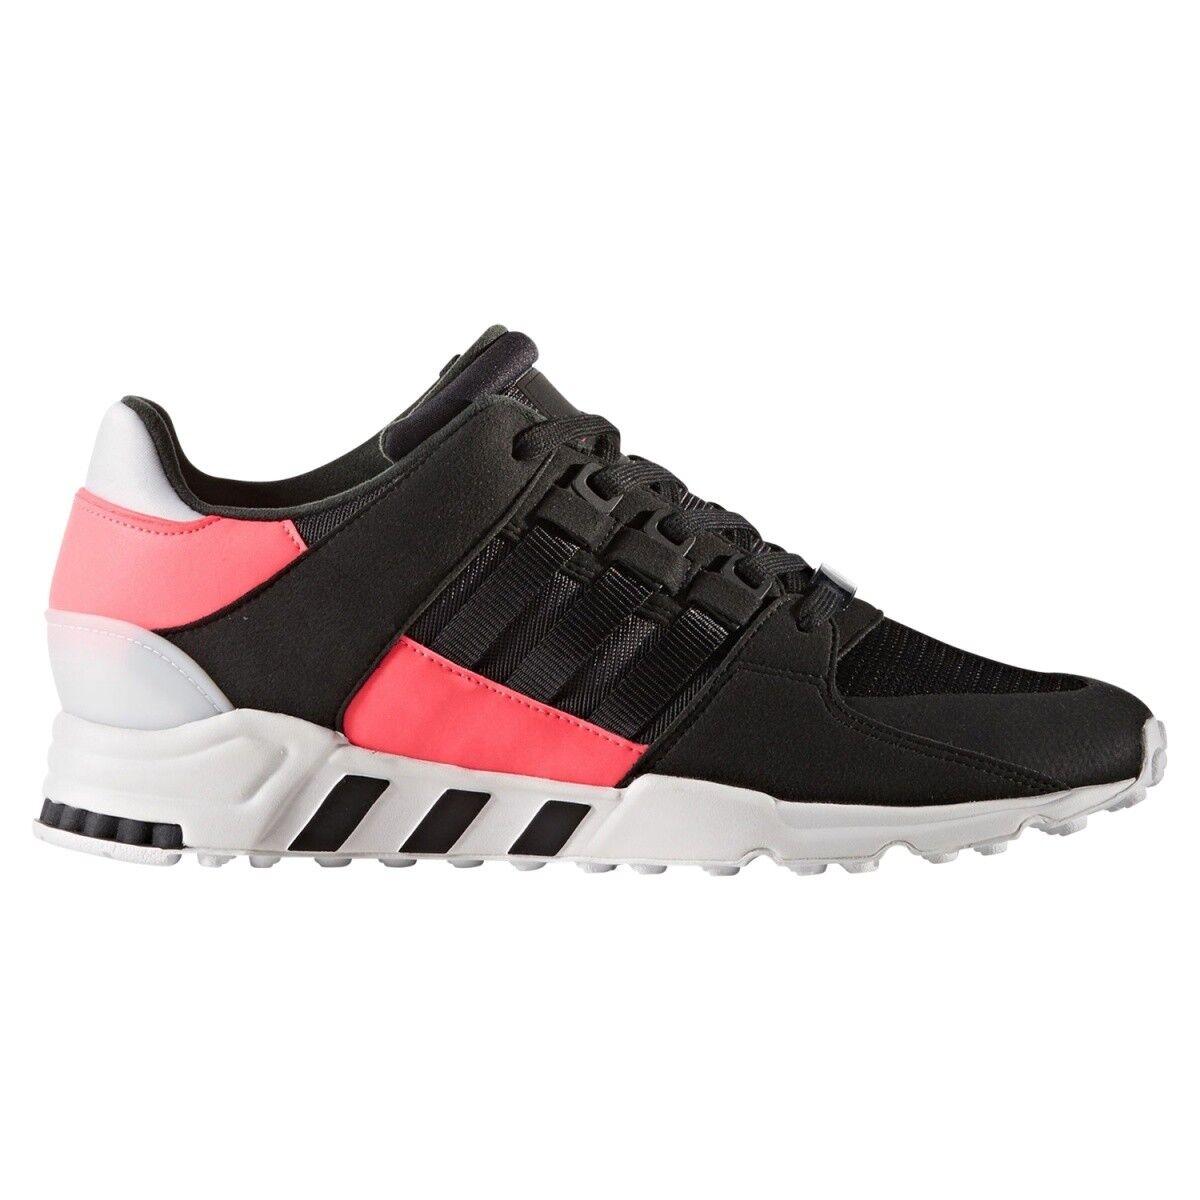 Adidas equipment unisex equipment Adidas support cortos Lifestyle zapatos casual zapatos 660906